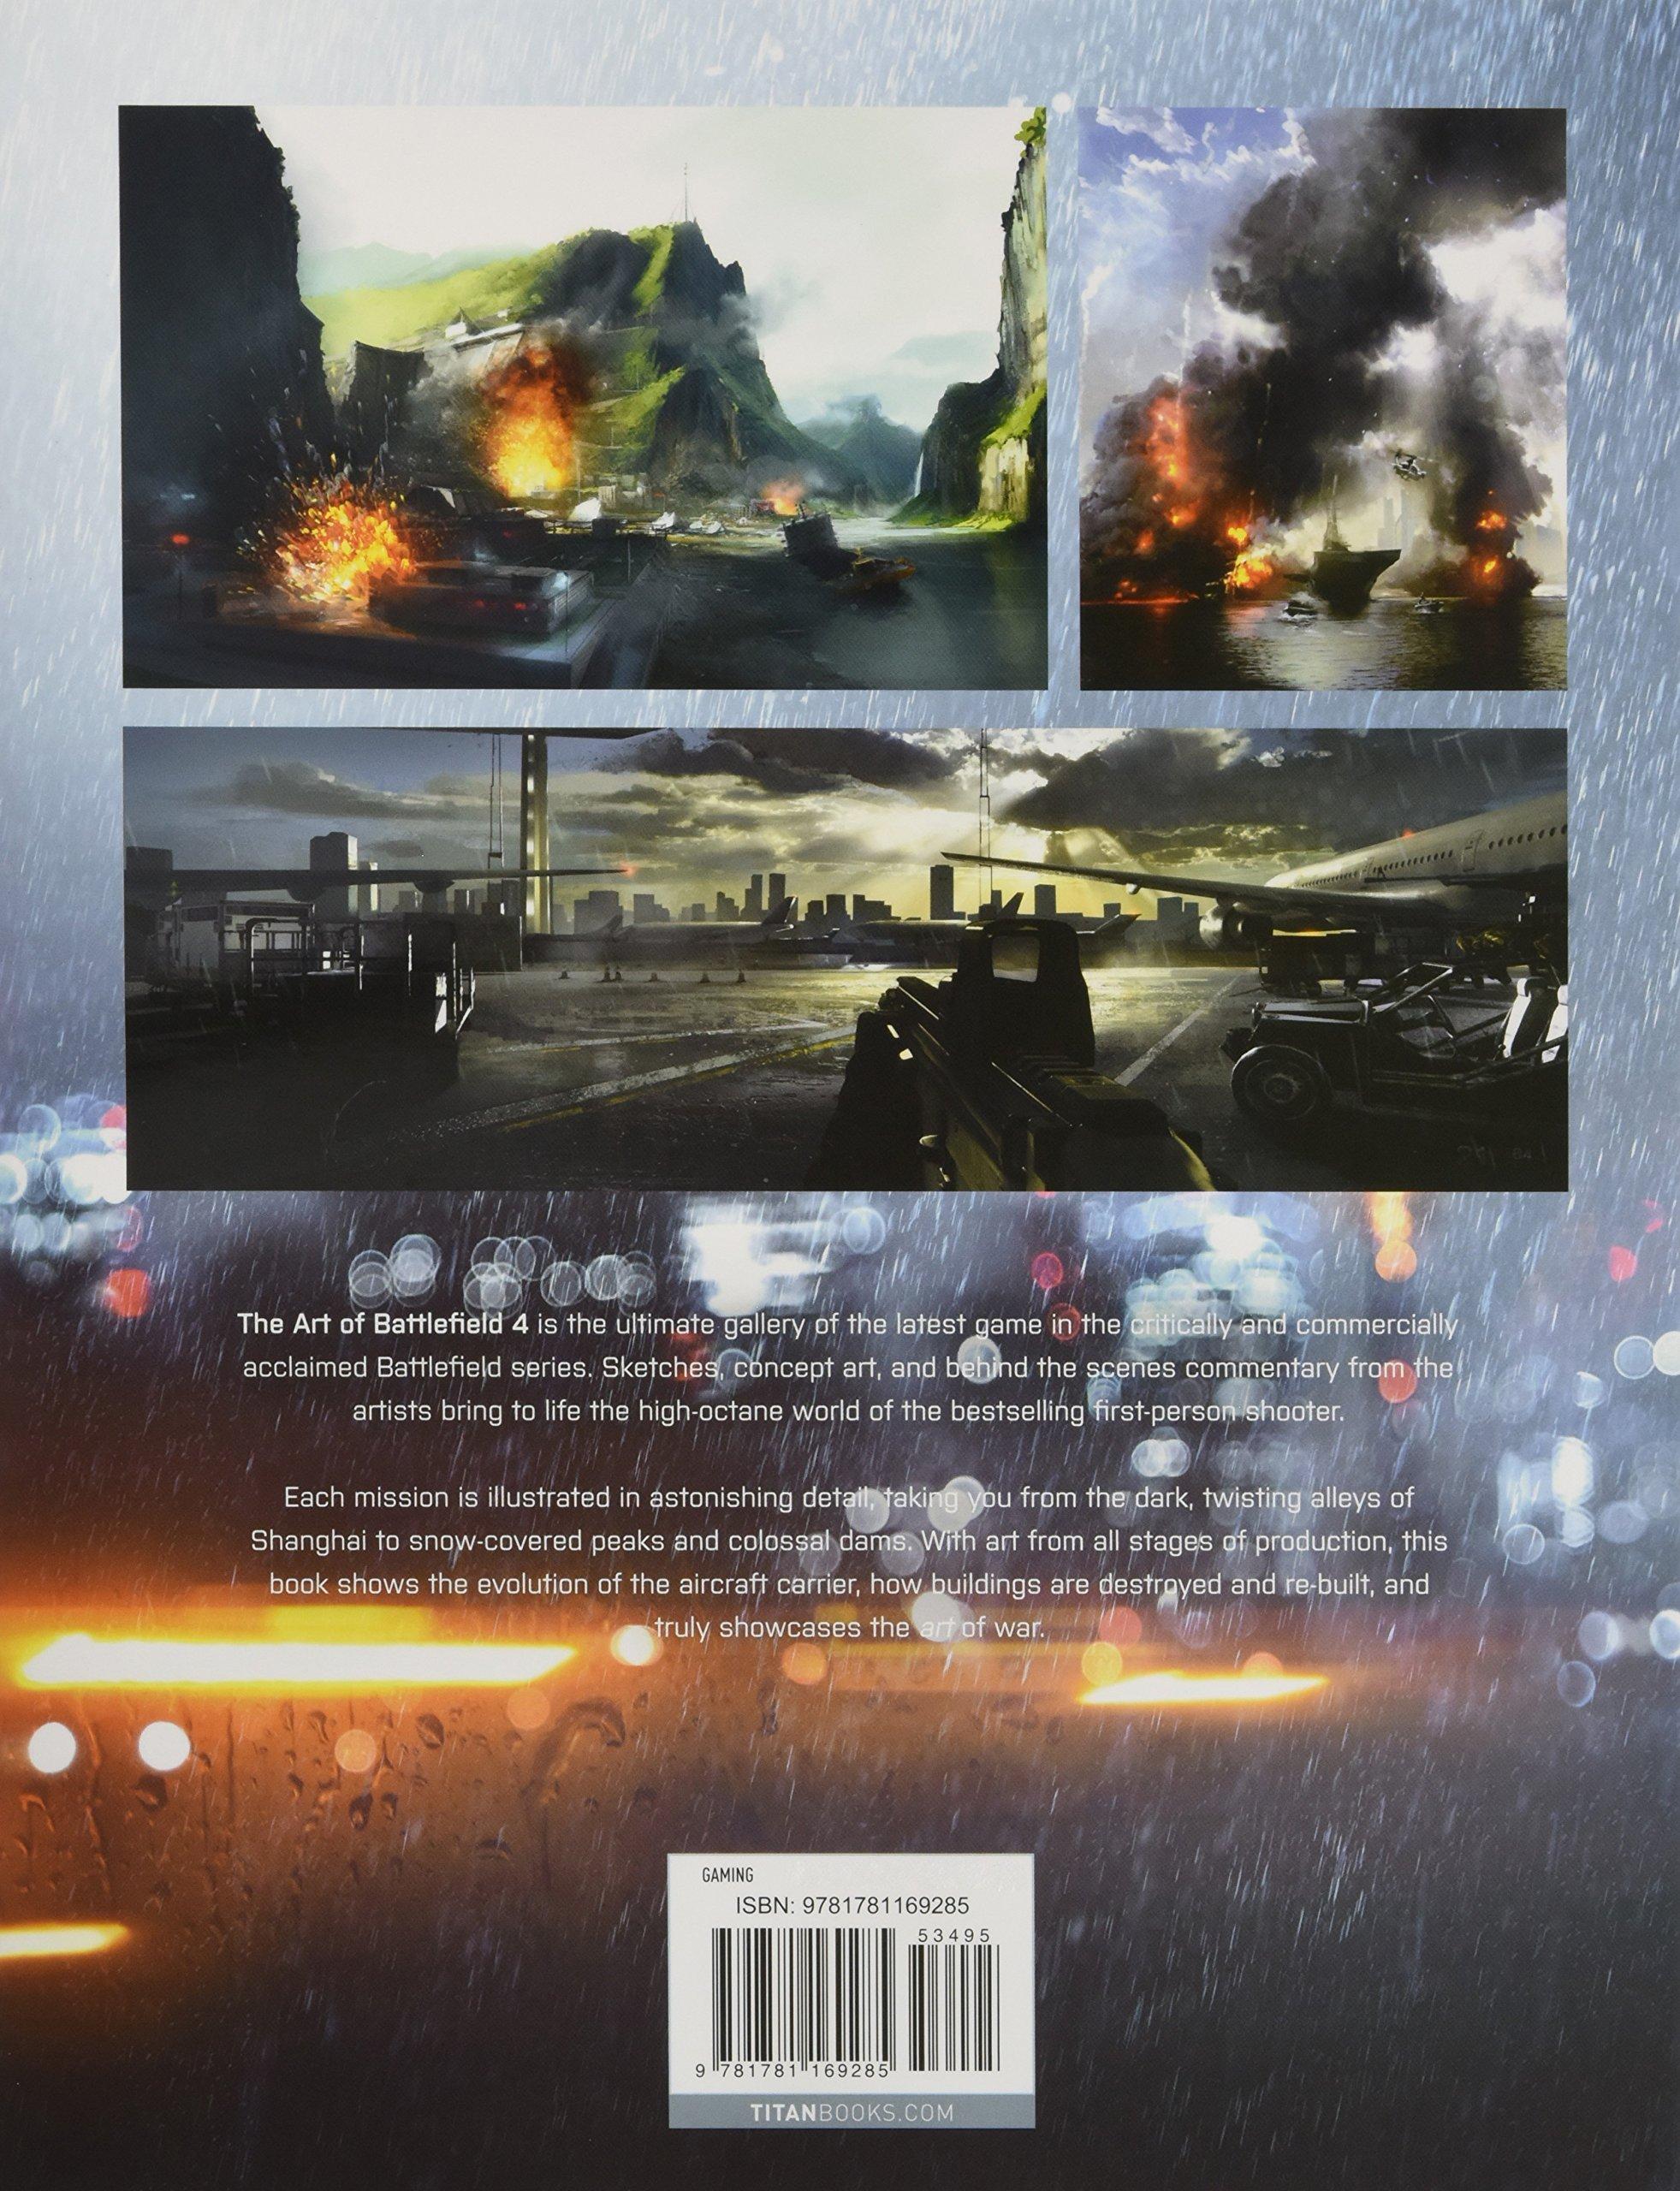 Amazon Com The Art Of Battlefield 4 9781781169285 Robinson Martin Books